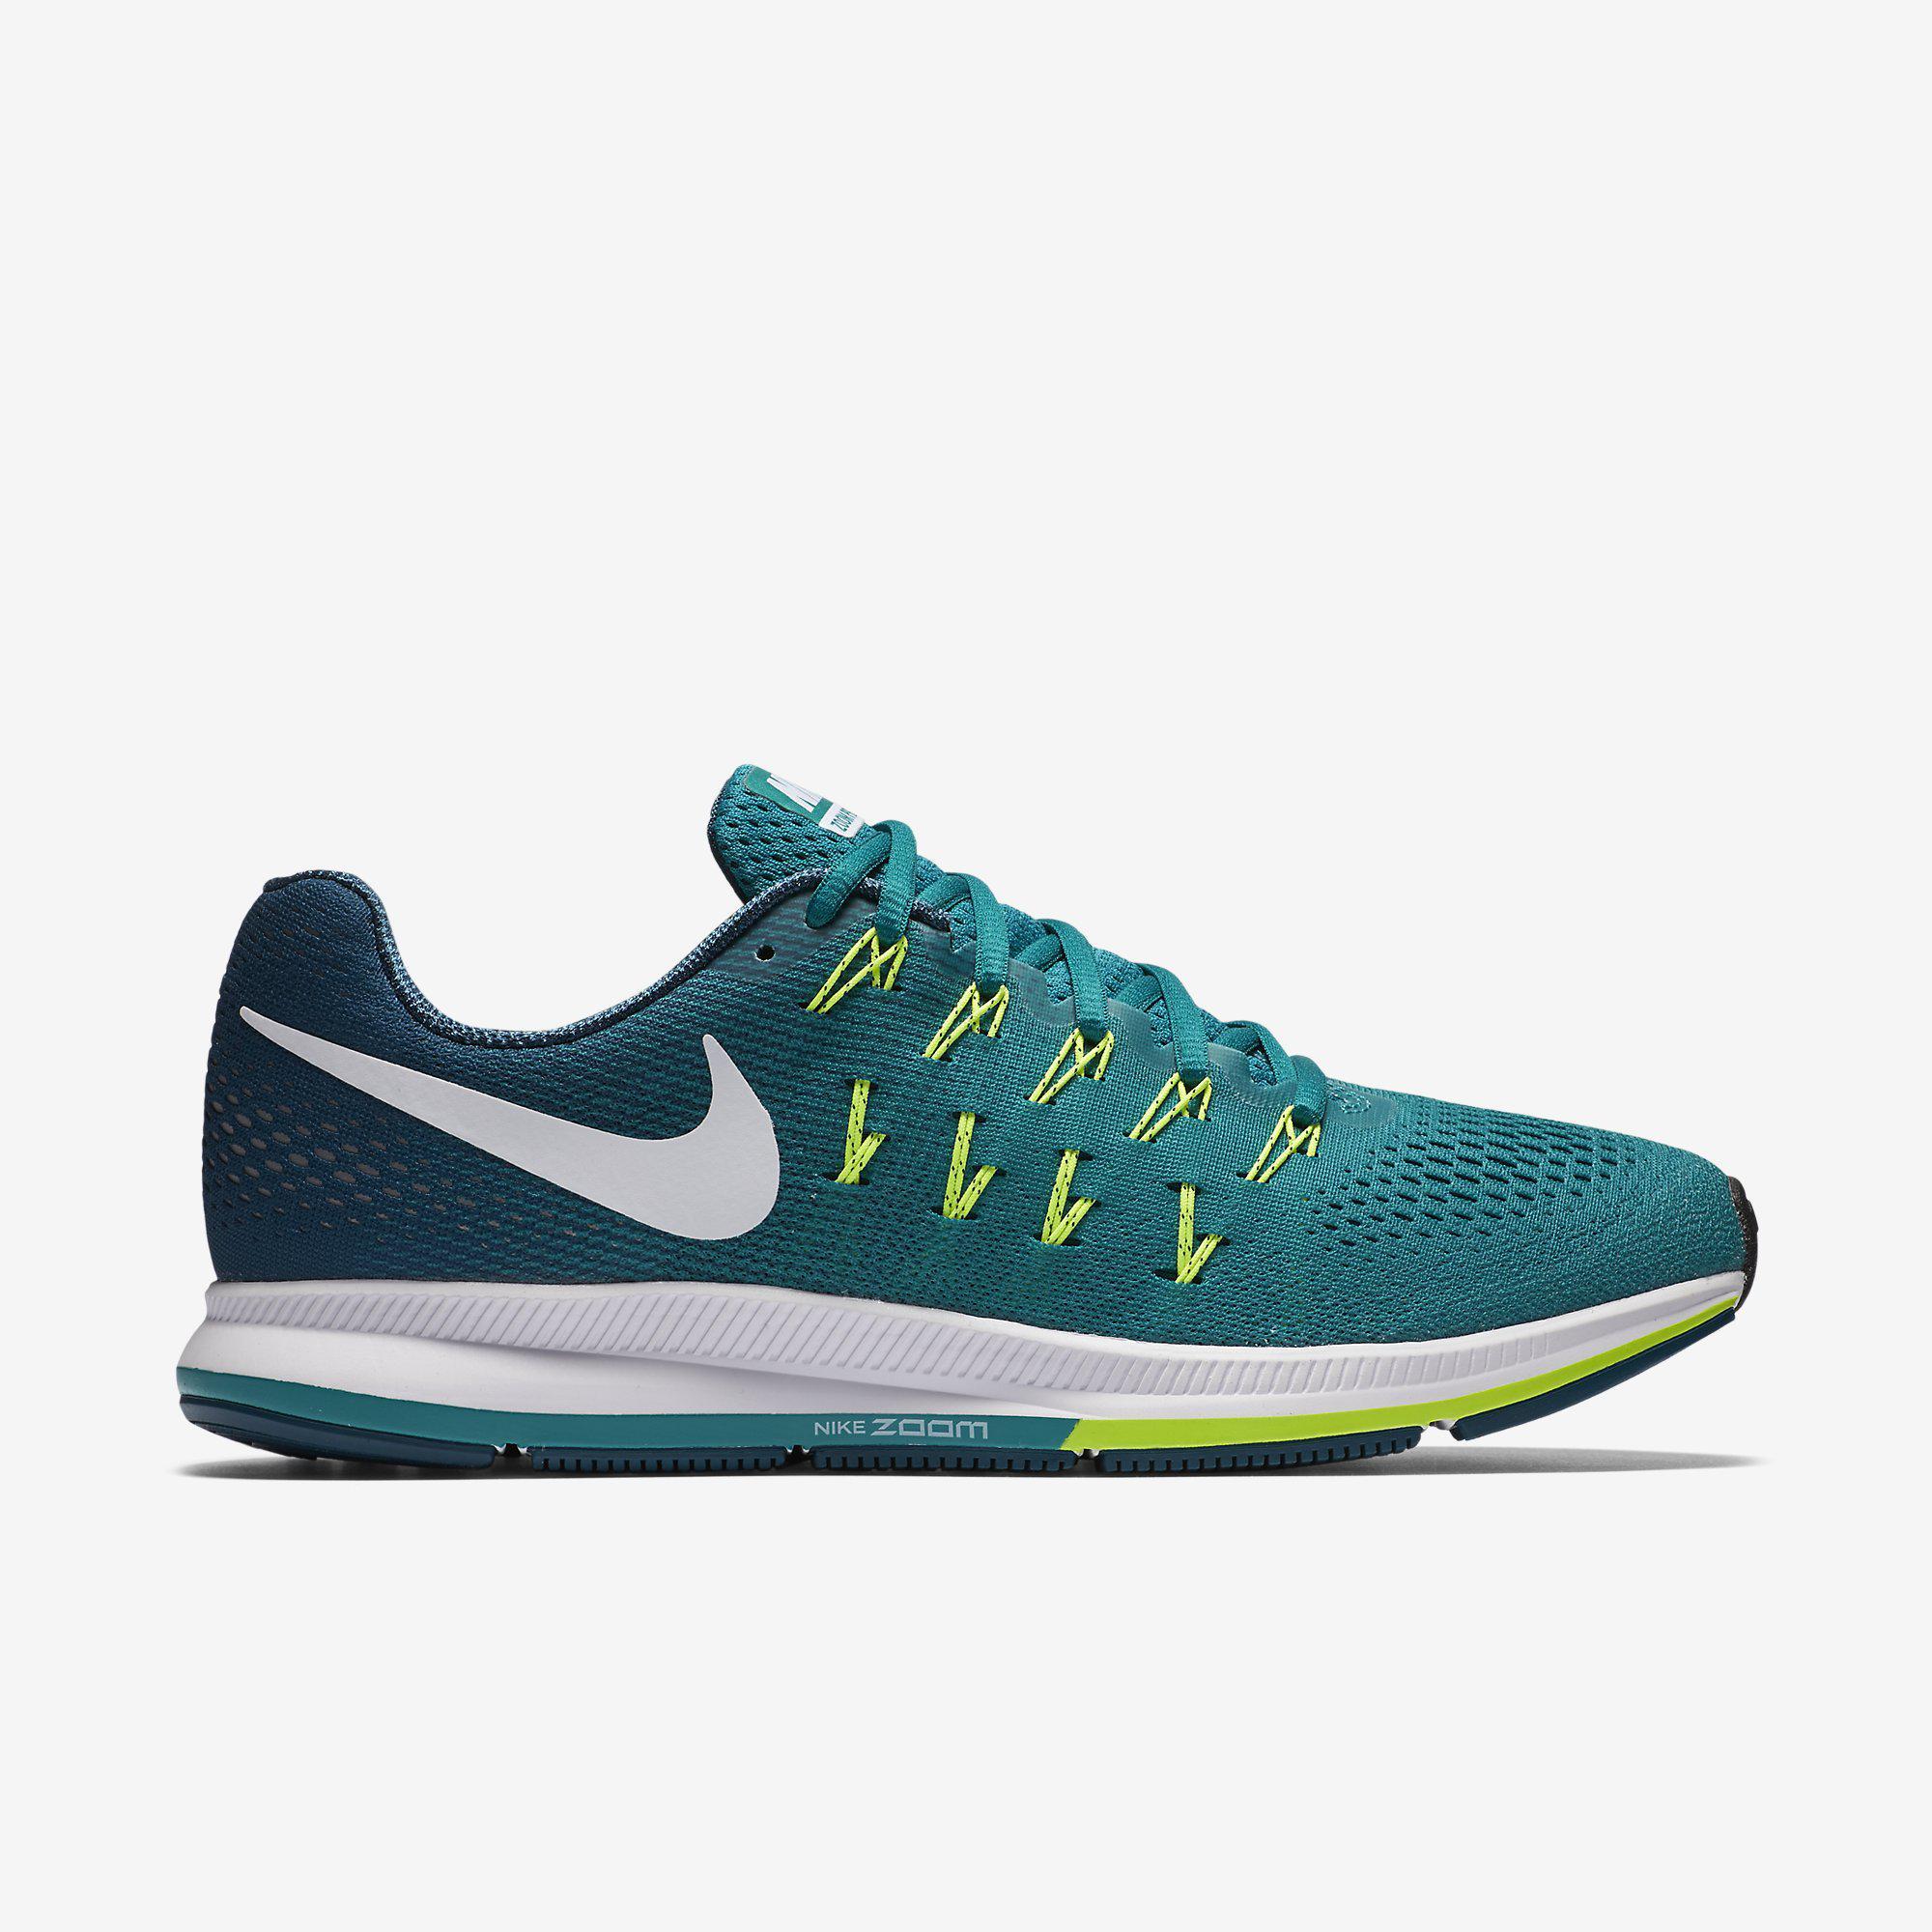 Nike Mens Air Zoom Pegasus 33 Running Shoes - Rio Teal Midnight Turquoise -  Tennisnuts.com 9a40d315c